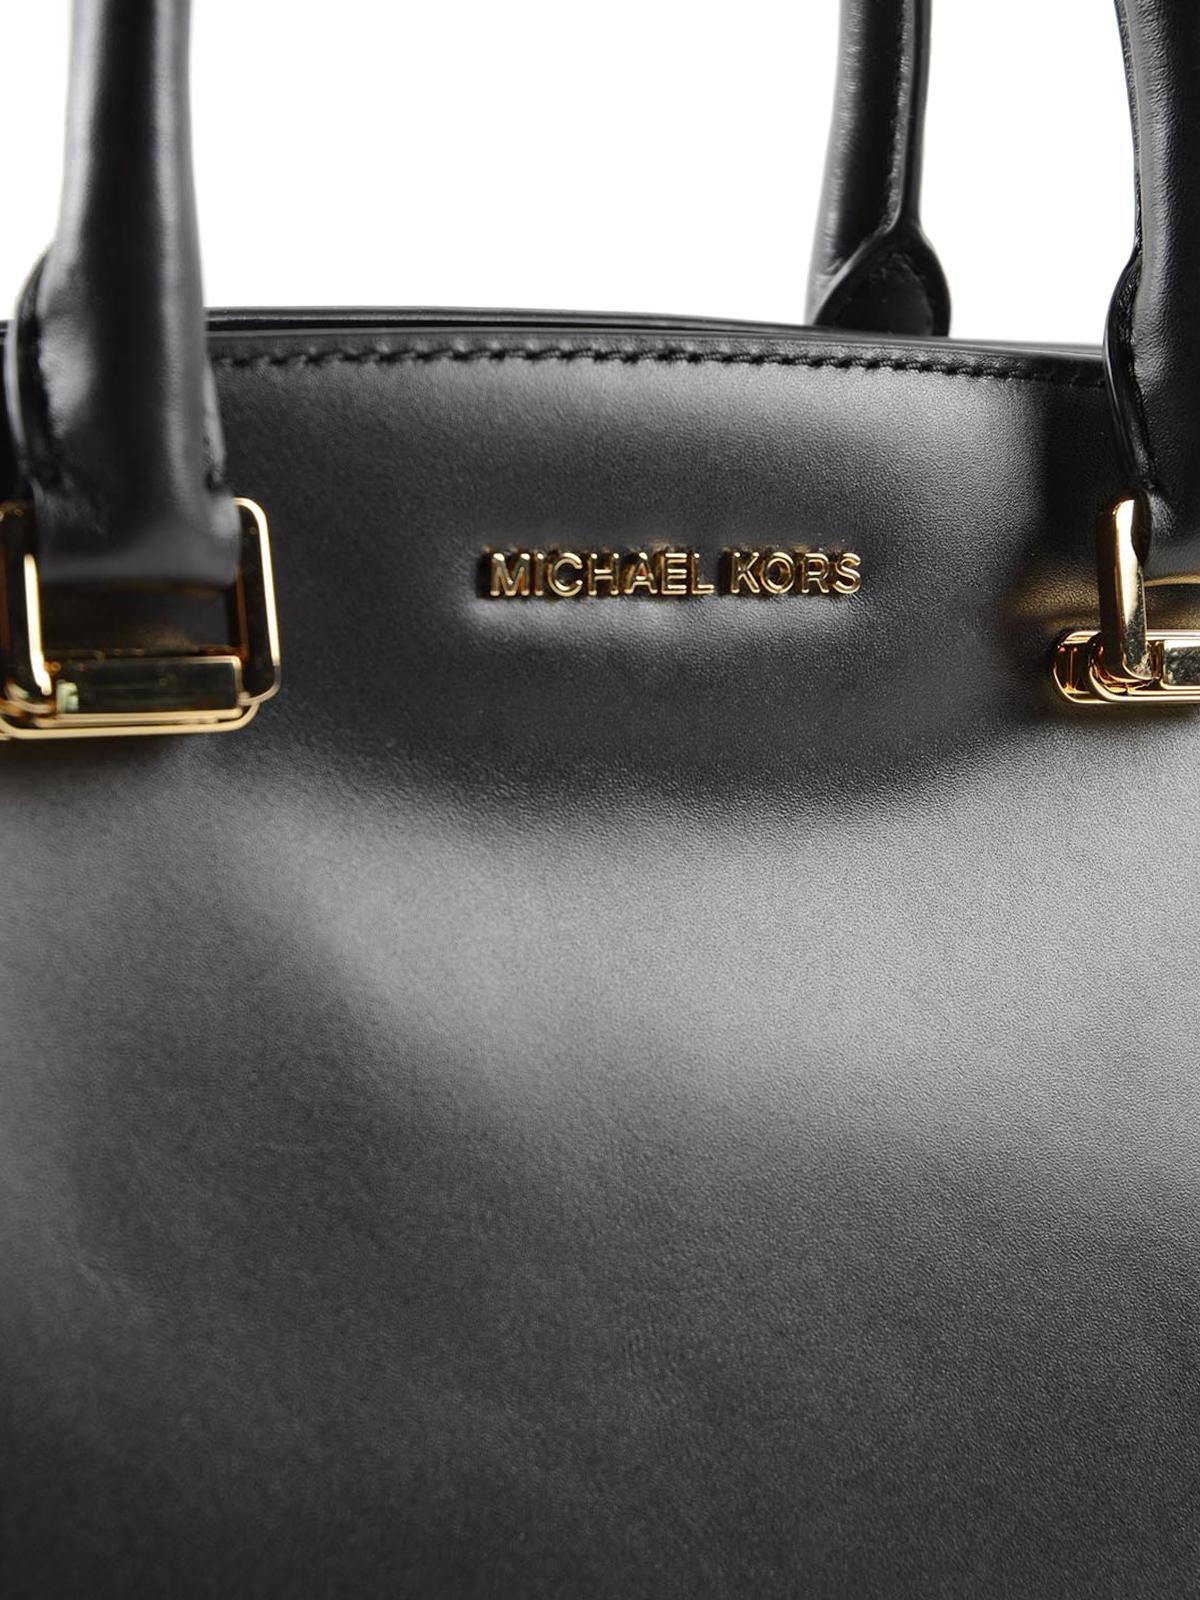 b84019c4fbd9a Michael Kors - Selma Swap leather tote - totes bags - 30S7GP2S2L001